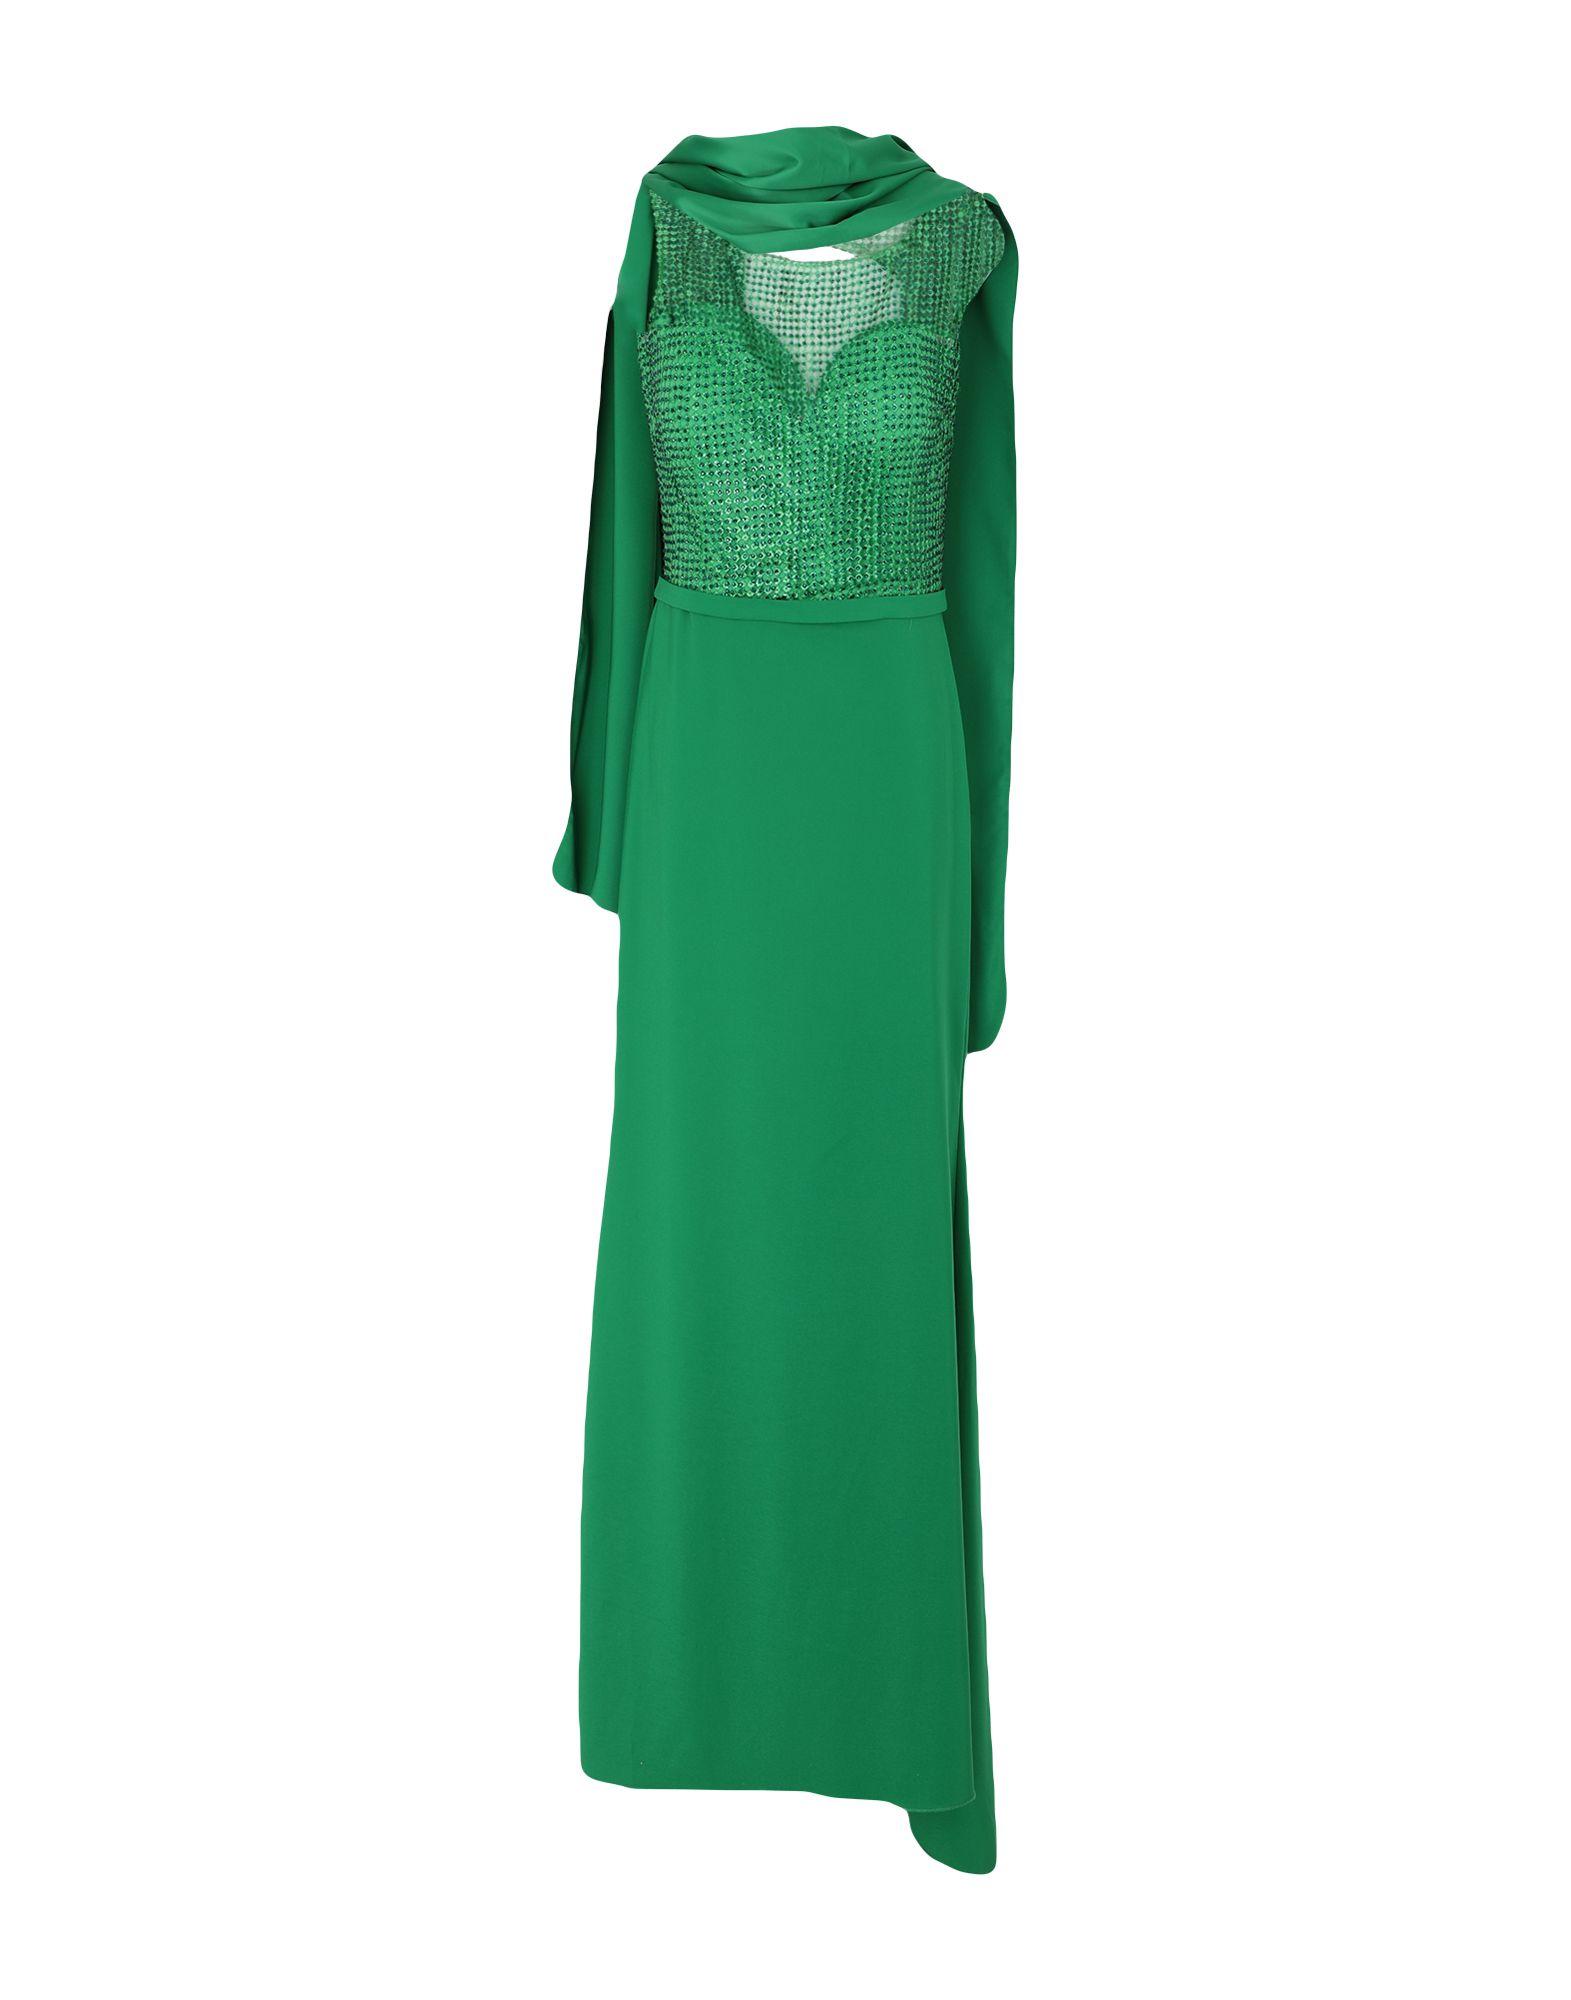 Фото - NITE CHIC Длинное платье monnalisa chic платье